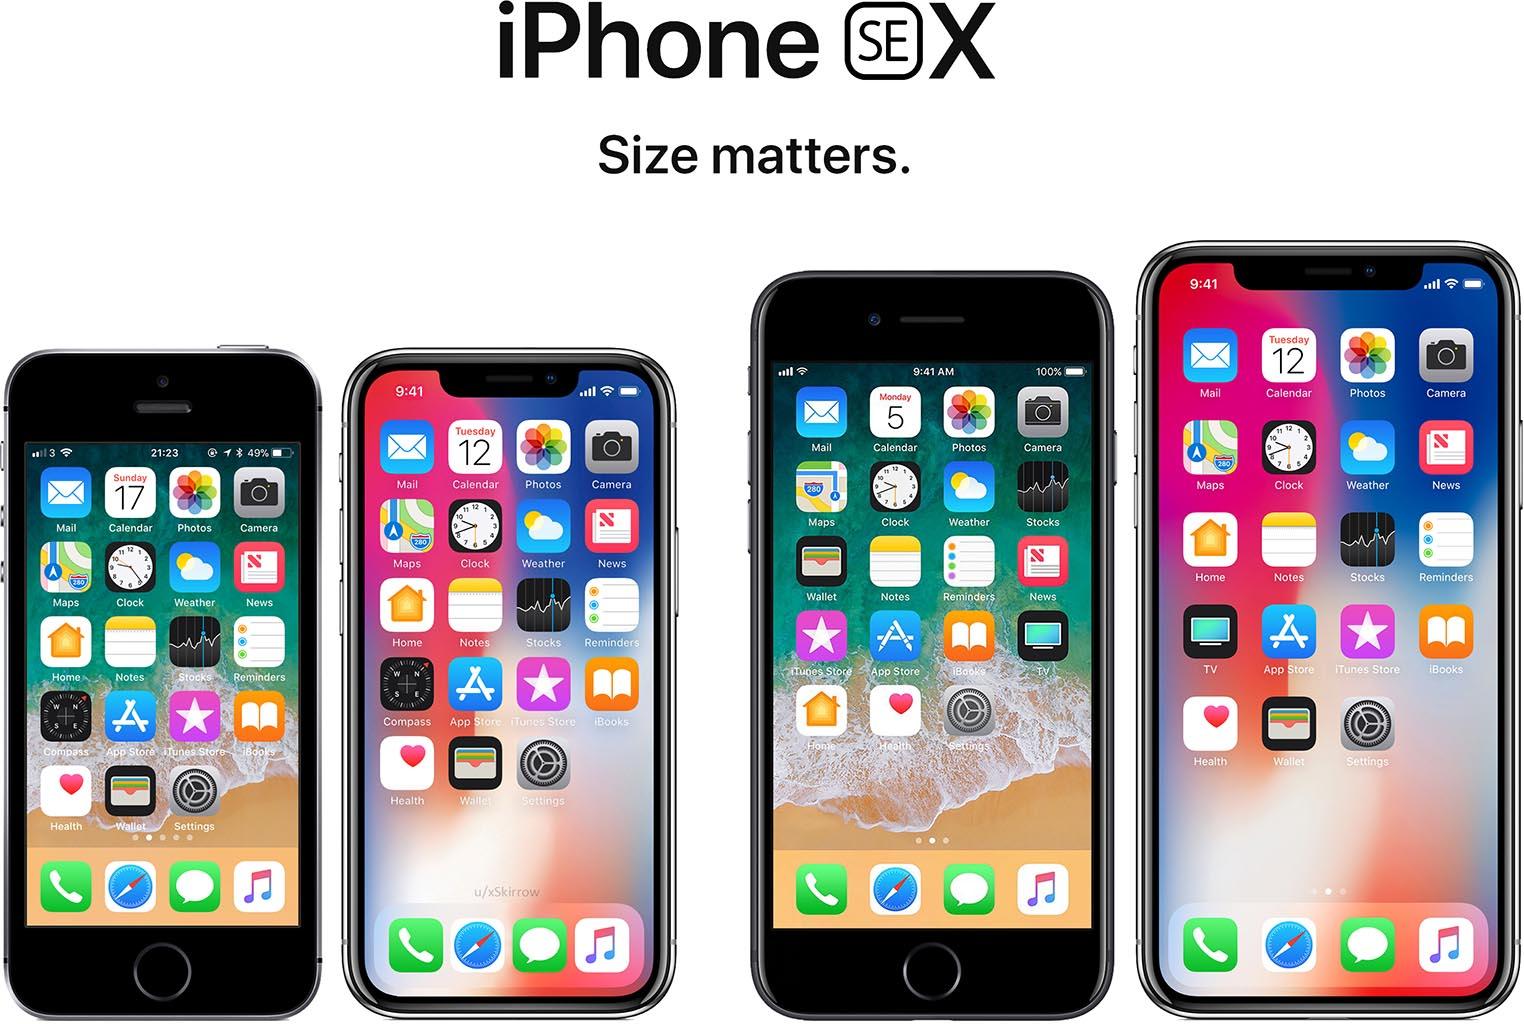 iPhone SE X Size Matters